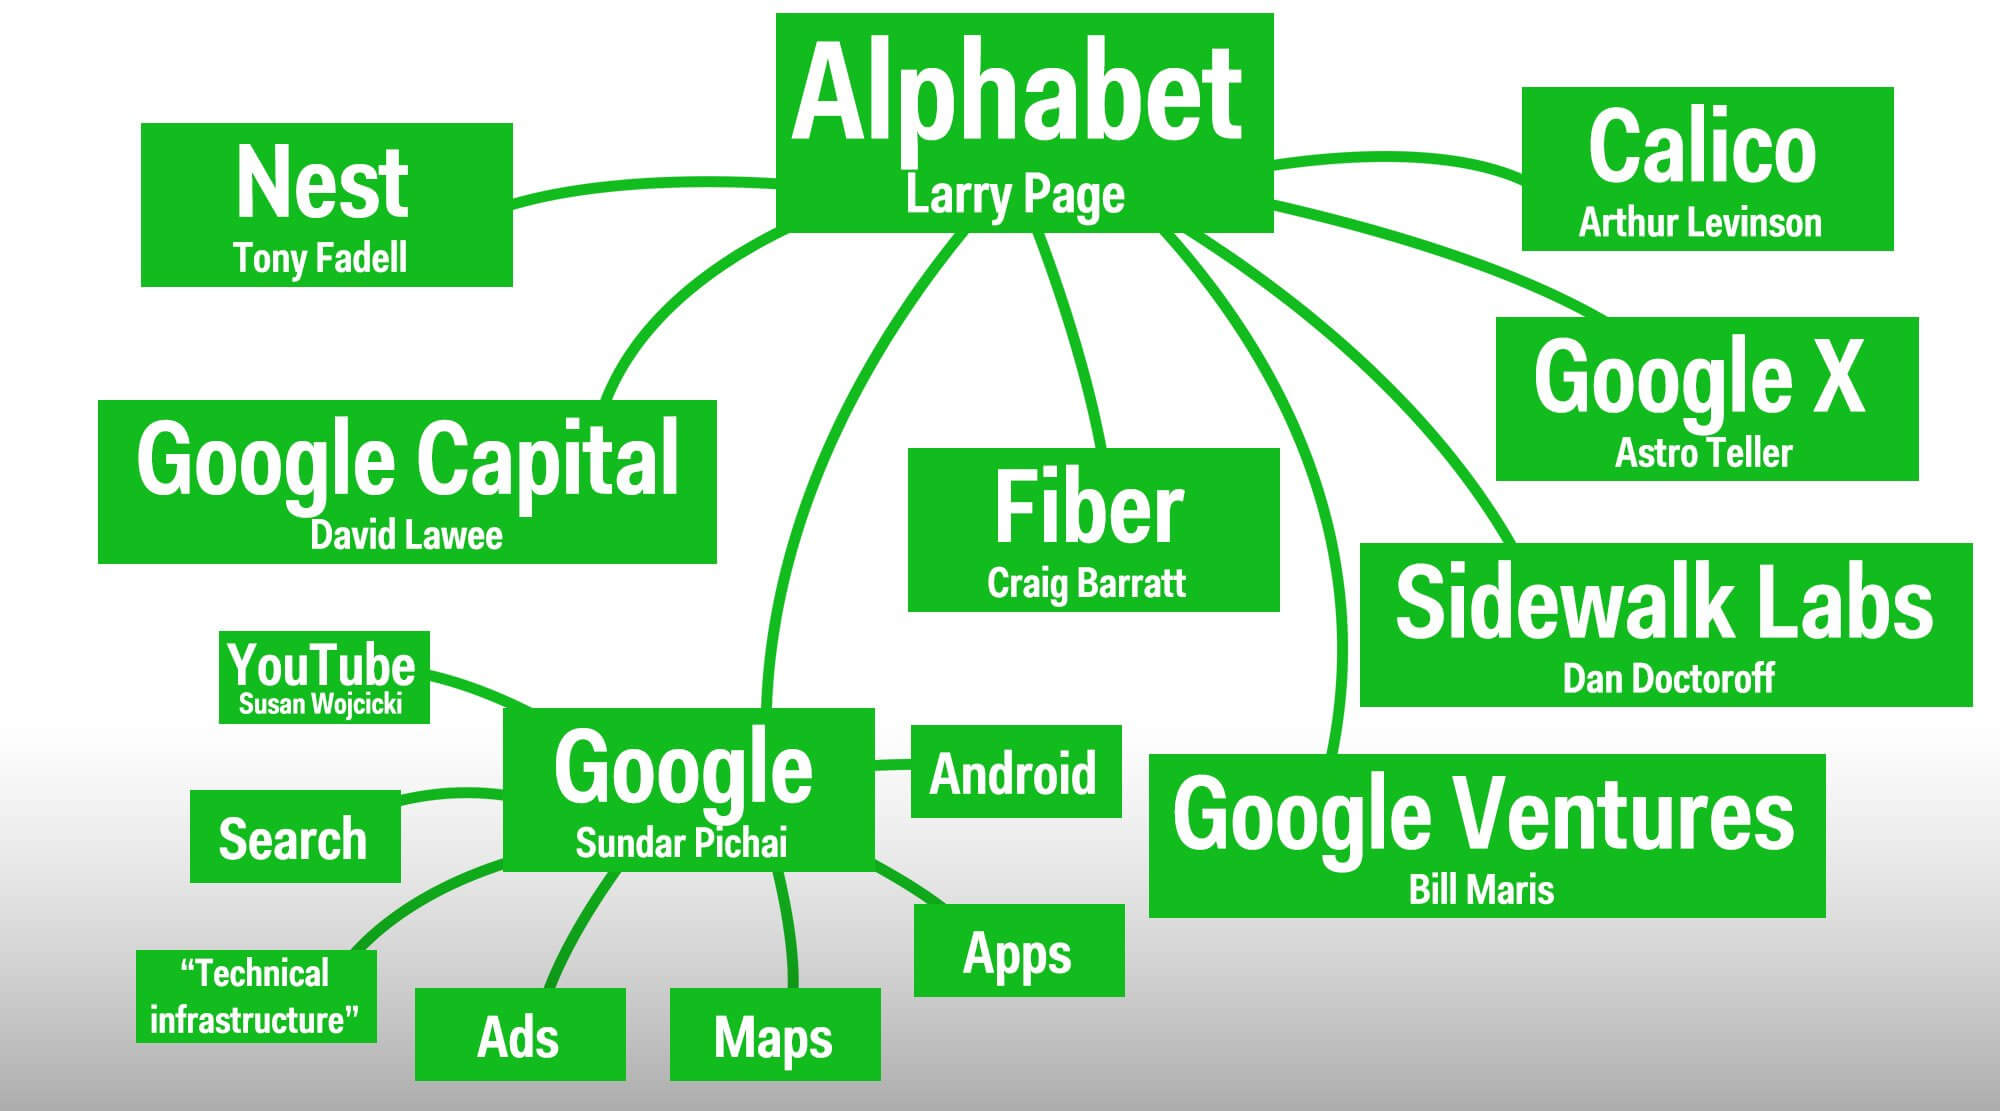 alphabet-larry-page